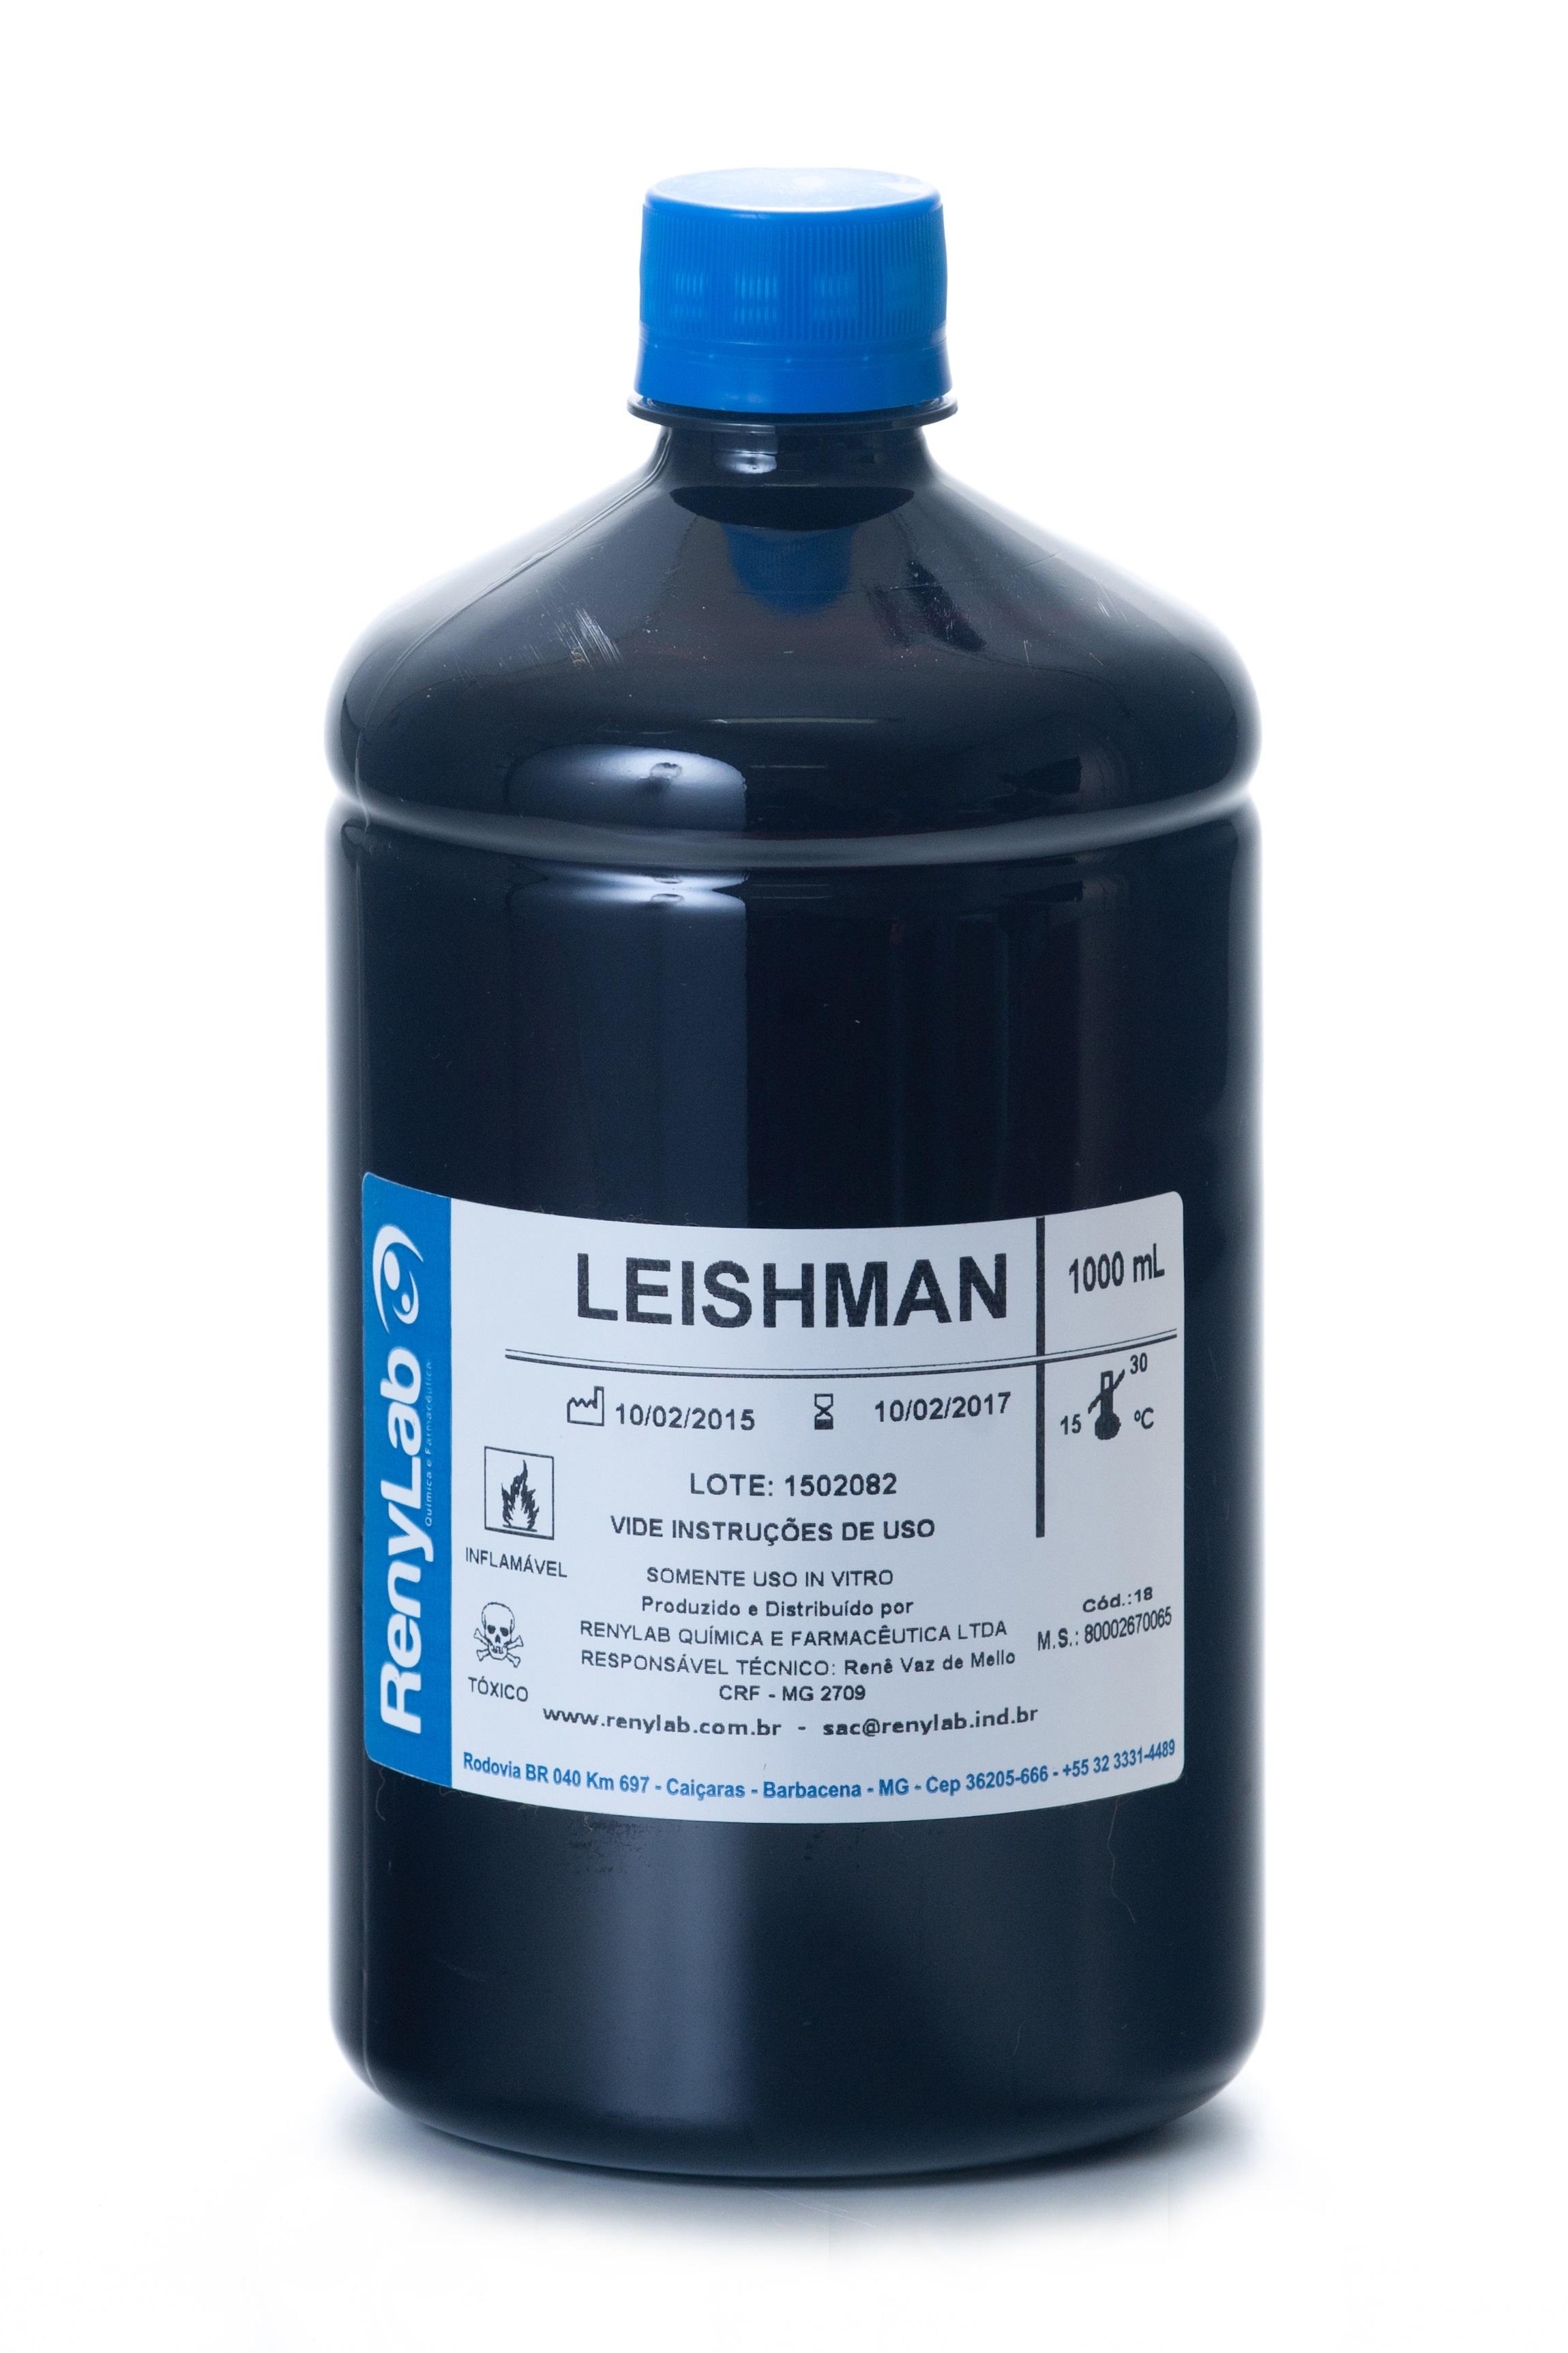 Leishman